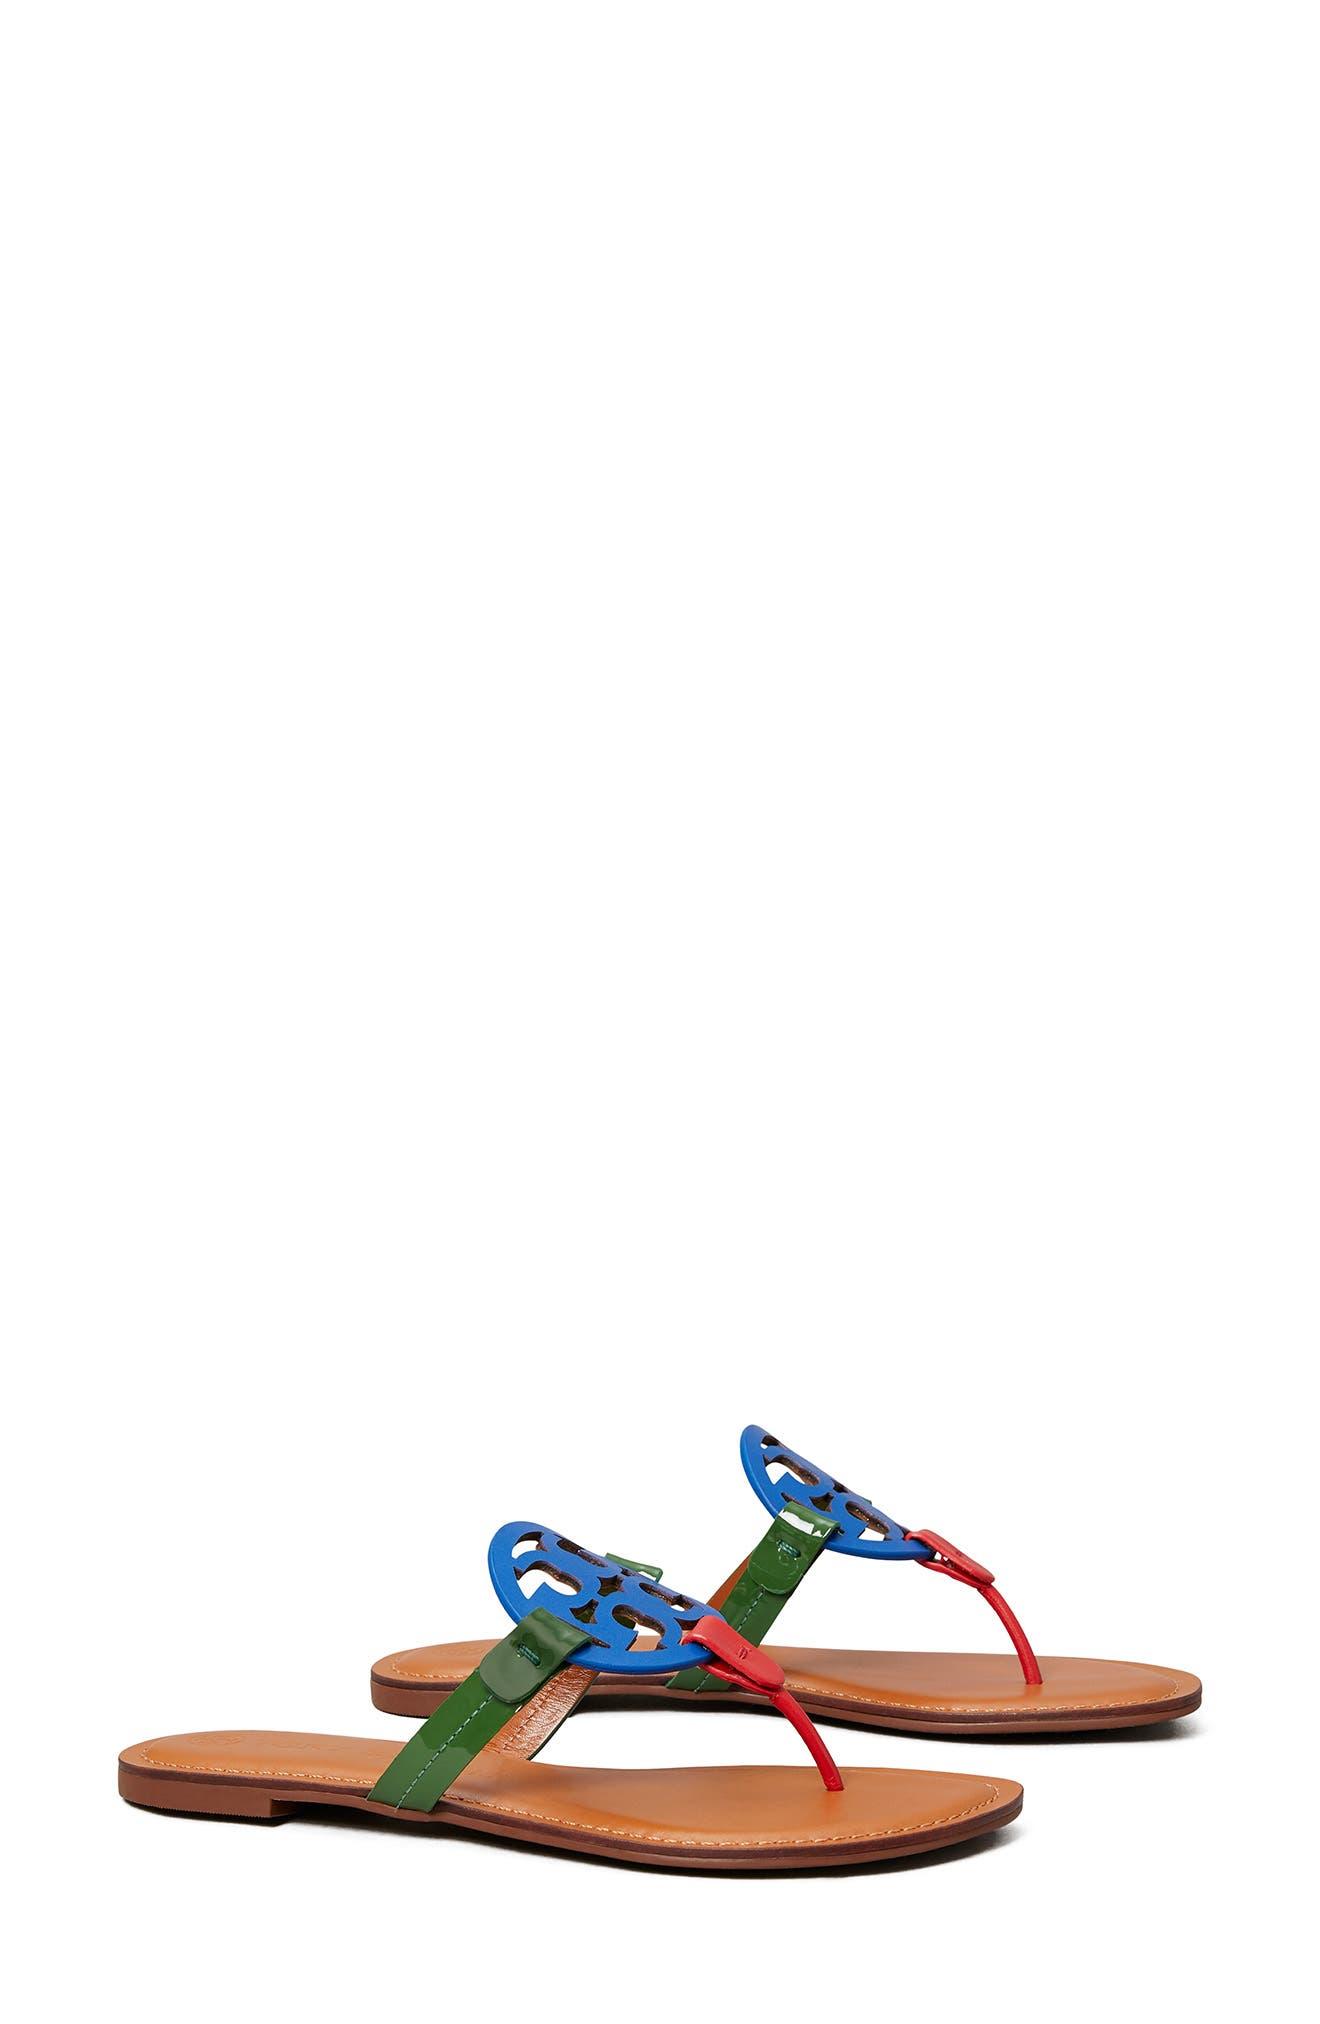 Tory Burch Flip-Flops for Women | Nordstrom